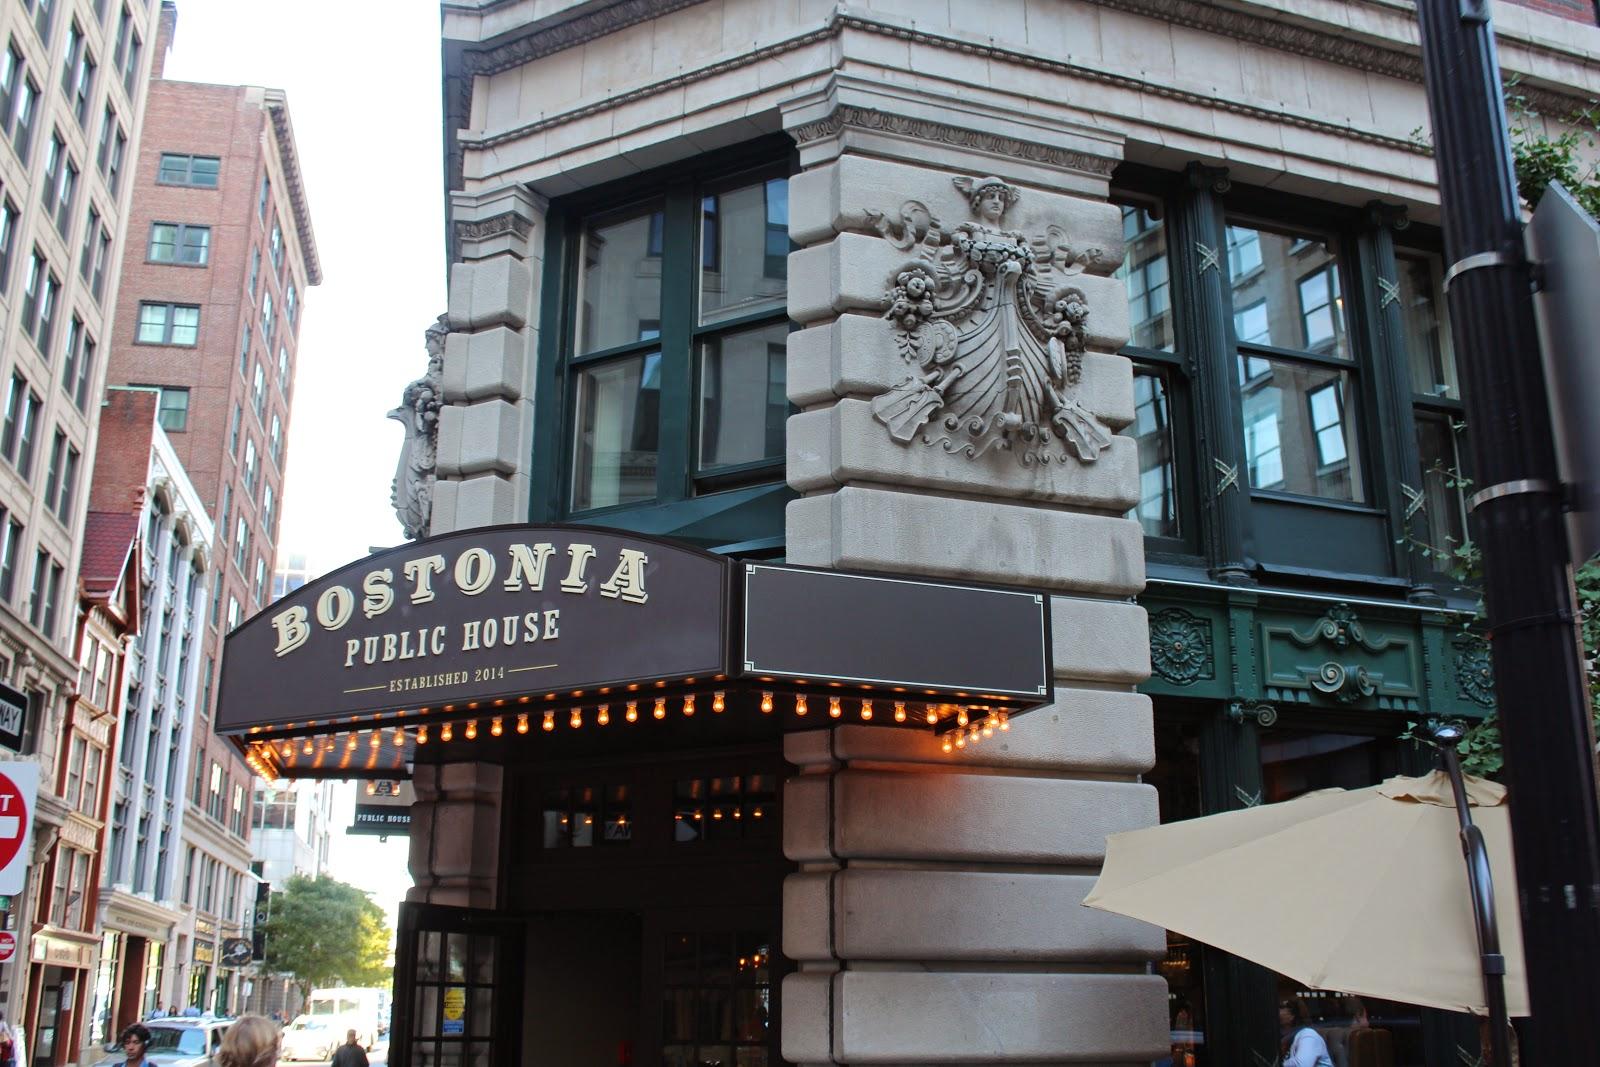 boston restaurant review: bostonia public house